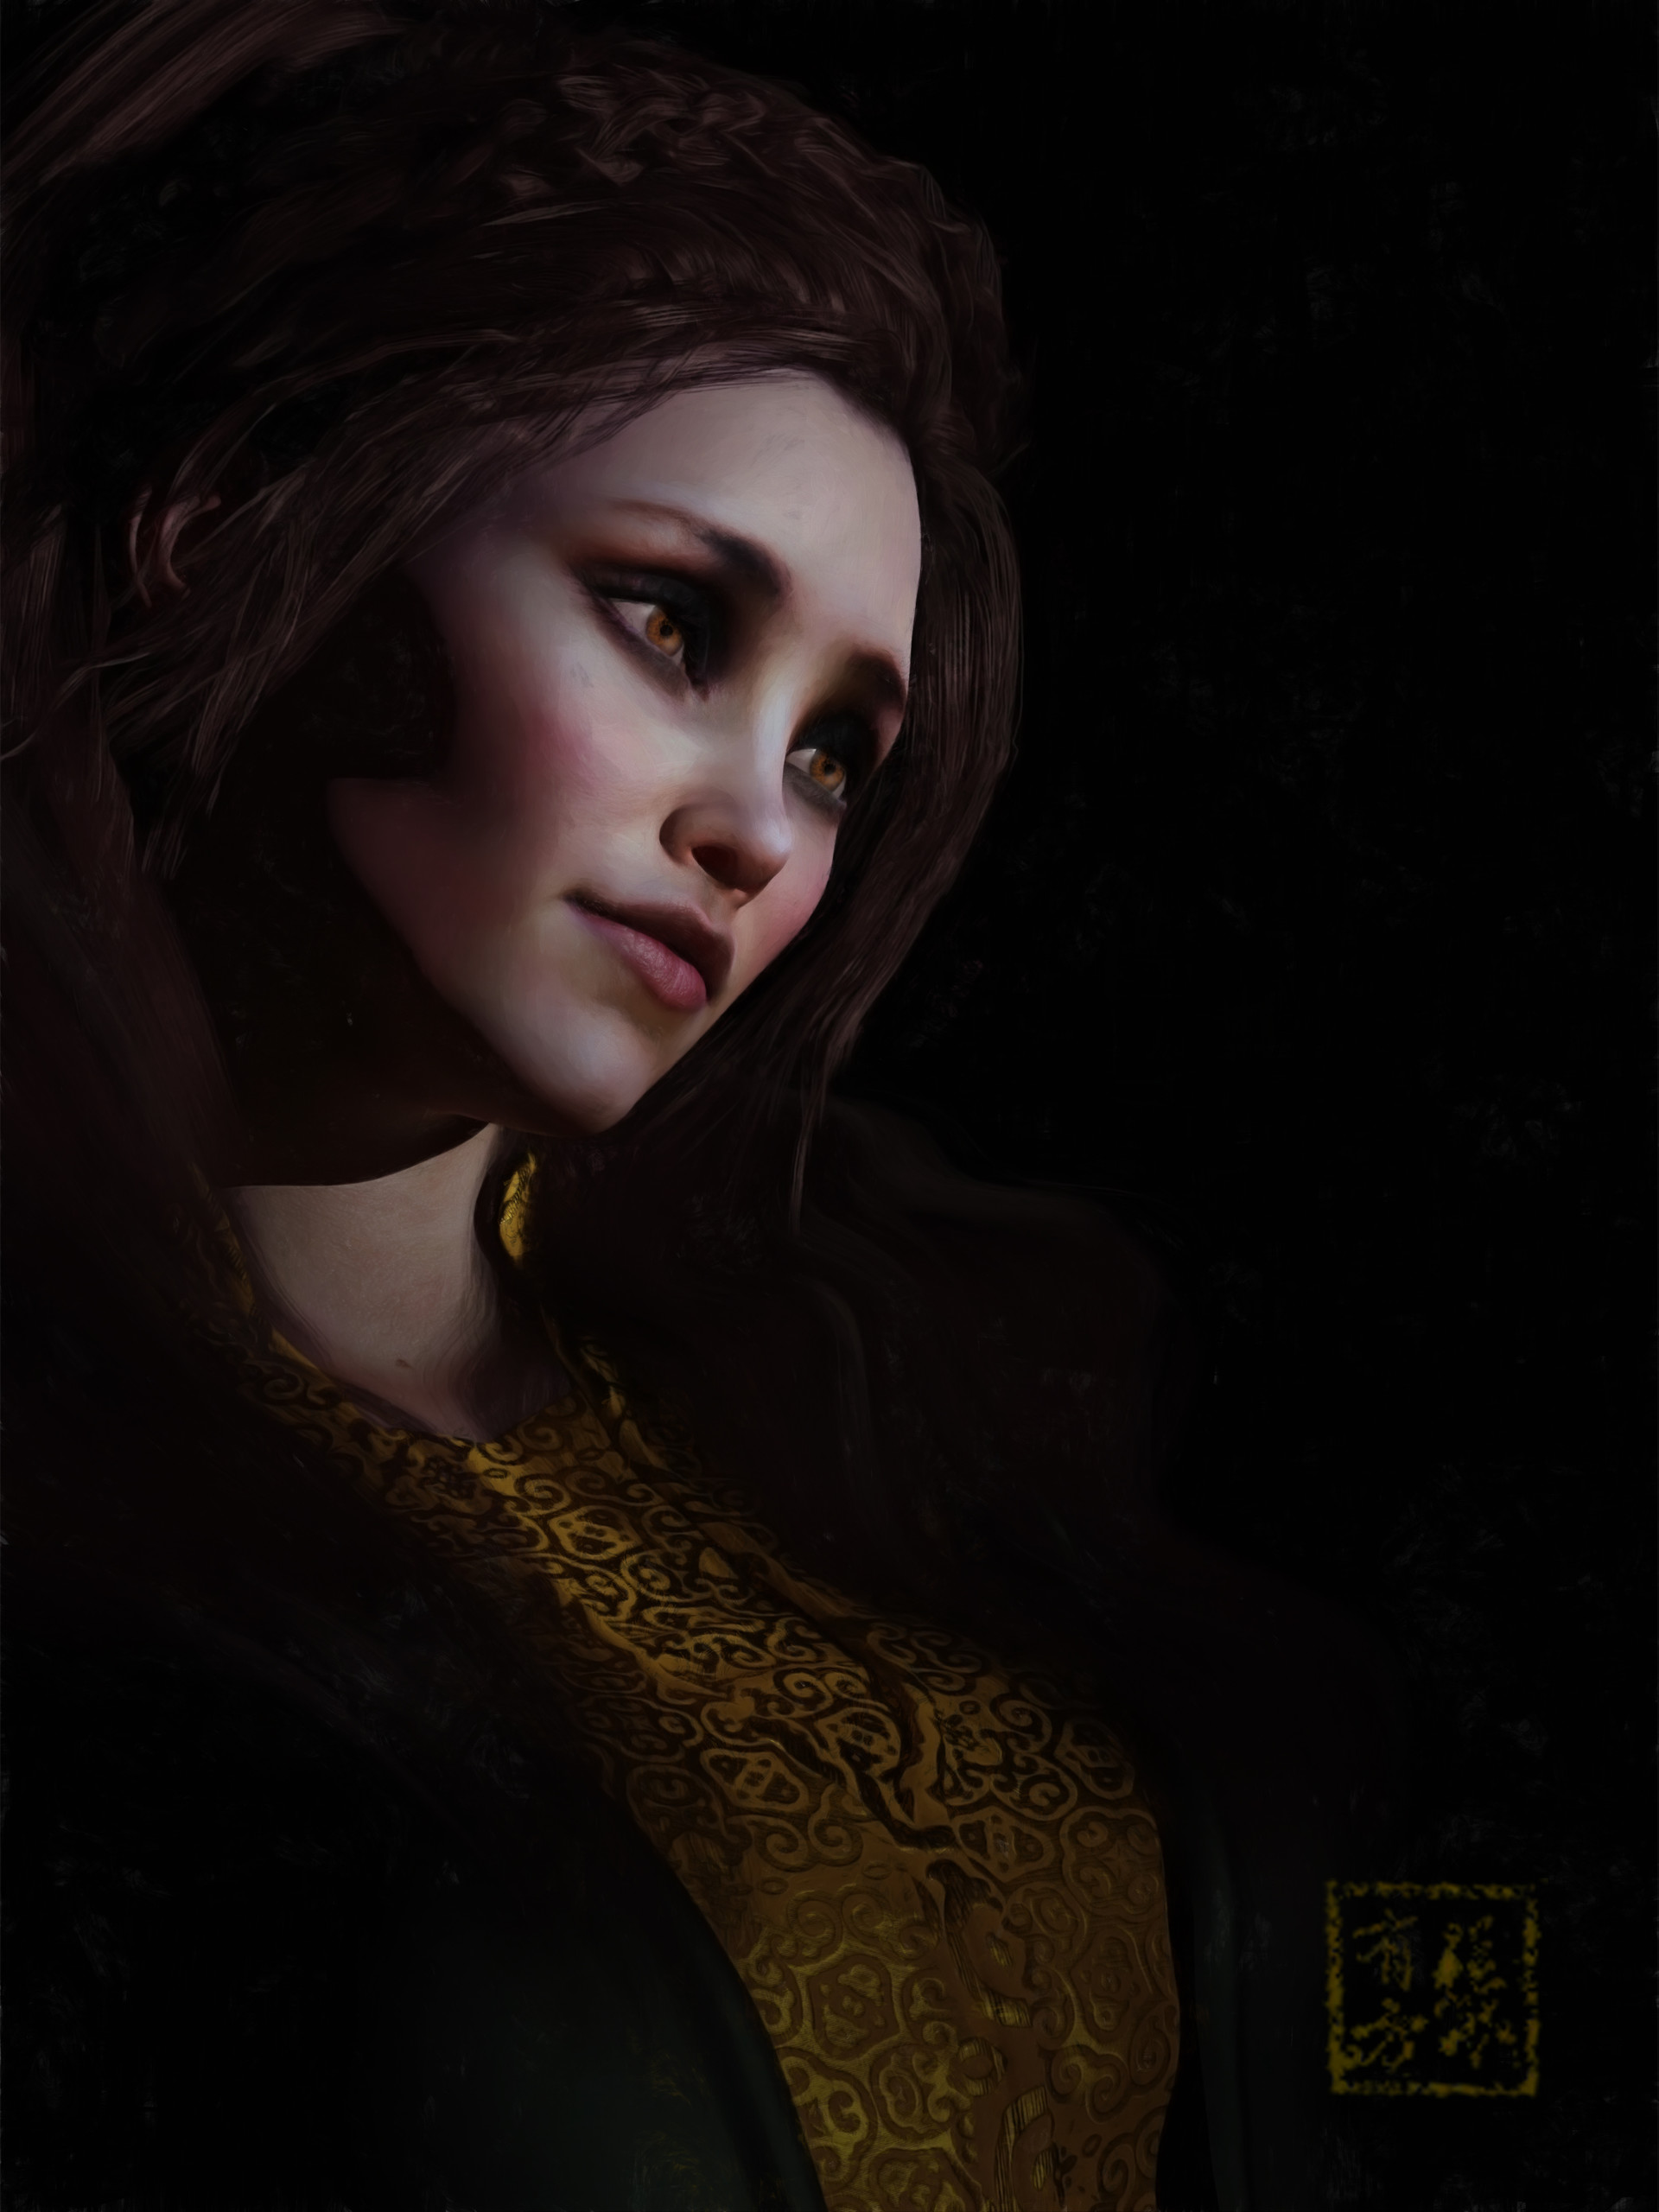 Benni amato margaerytyrell